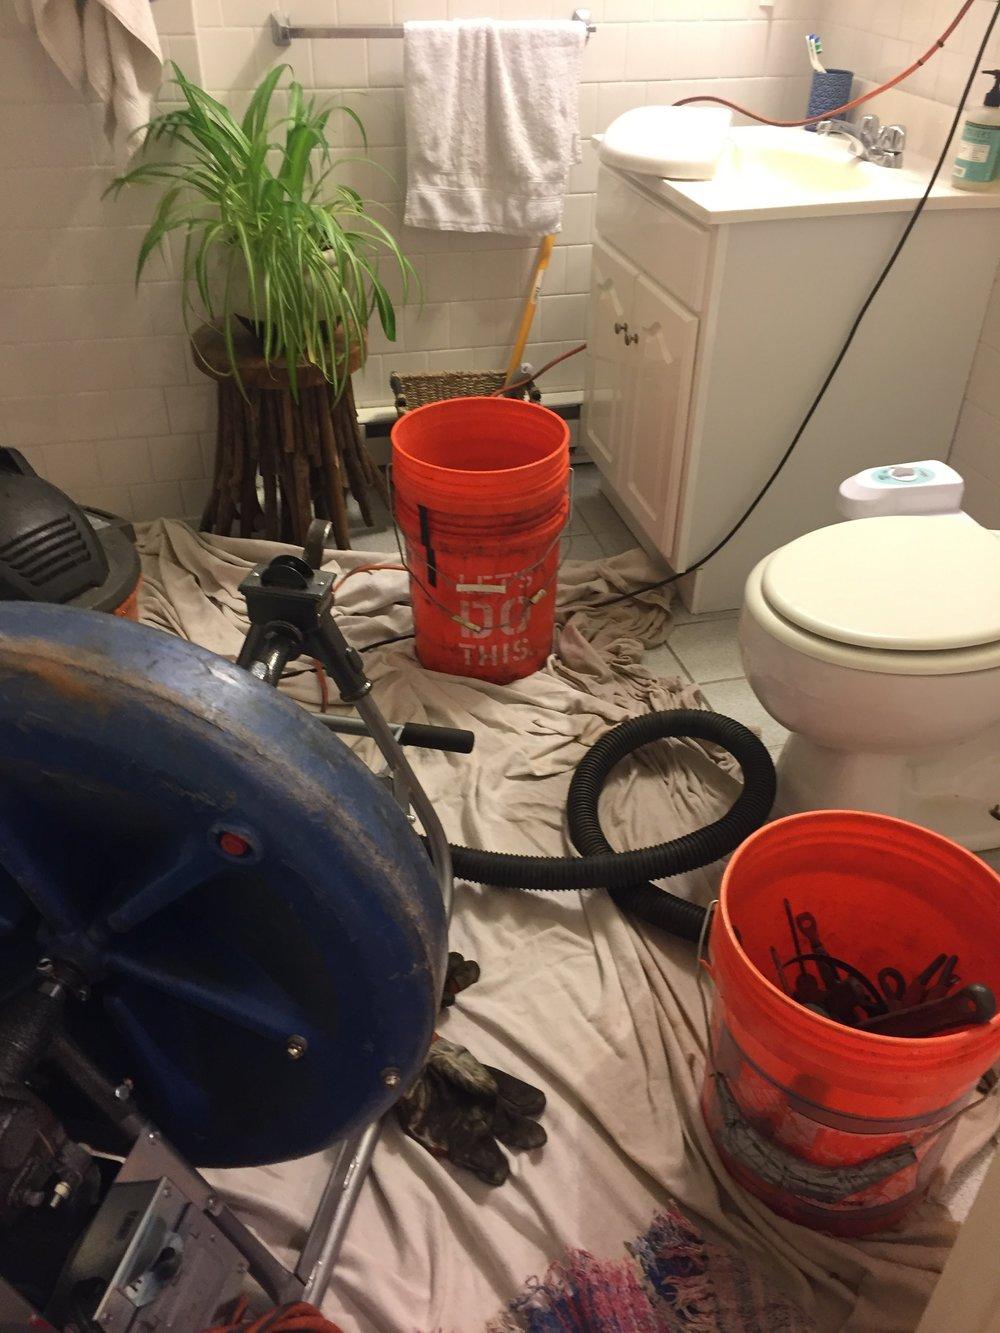 bathroom chaos.JPG